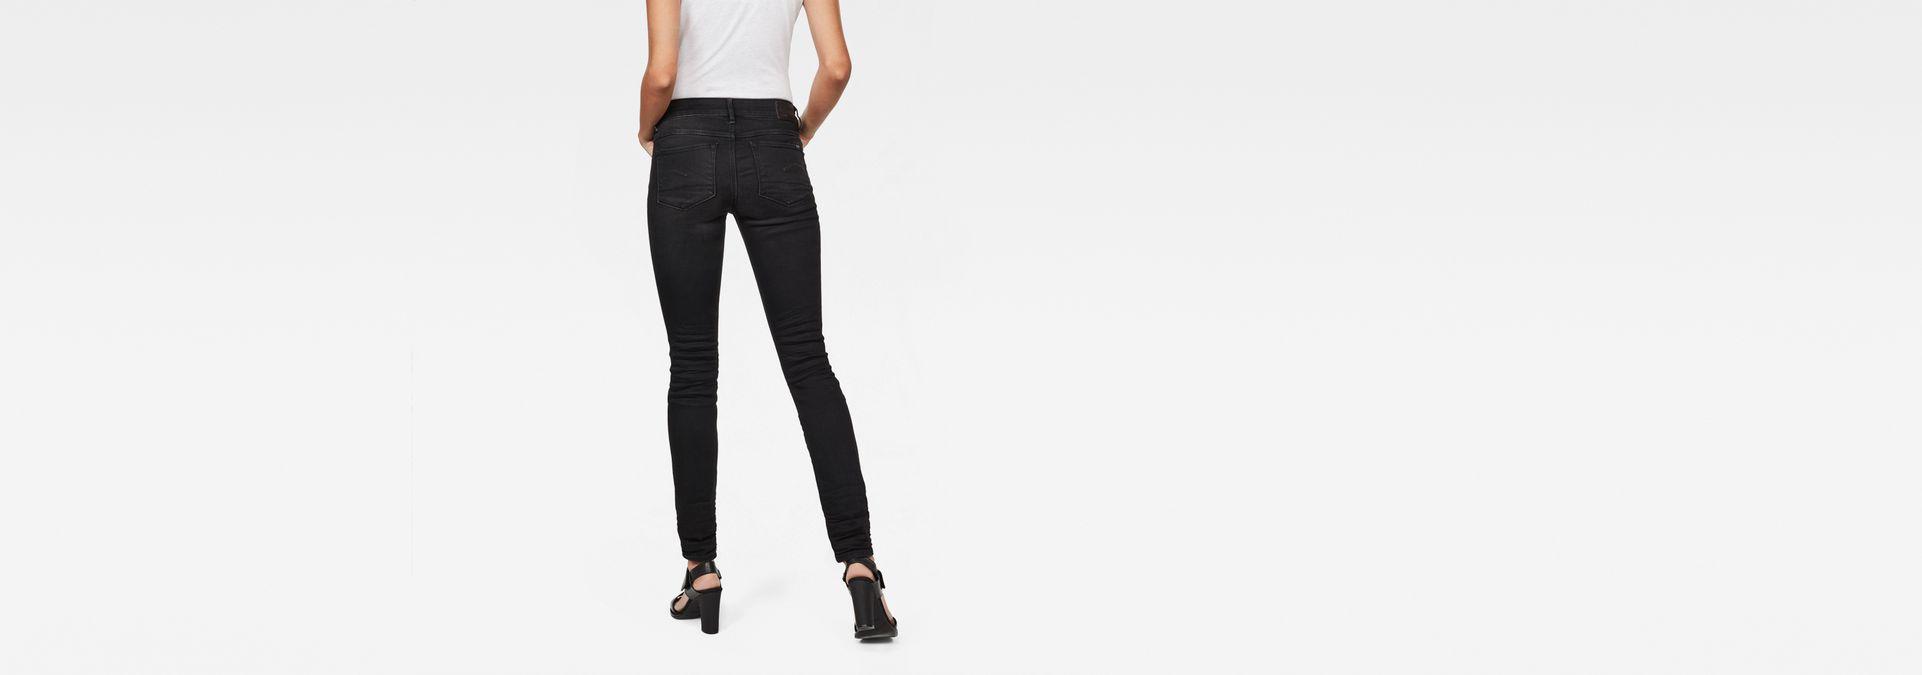 38a99f3eb6d 3301 Contour Skinny Jeans | Dark Aged | Women | G-Star RAW®